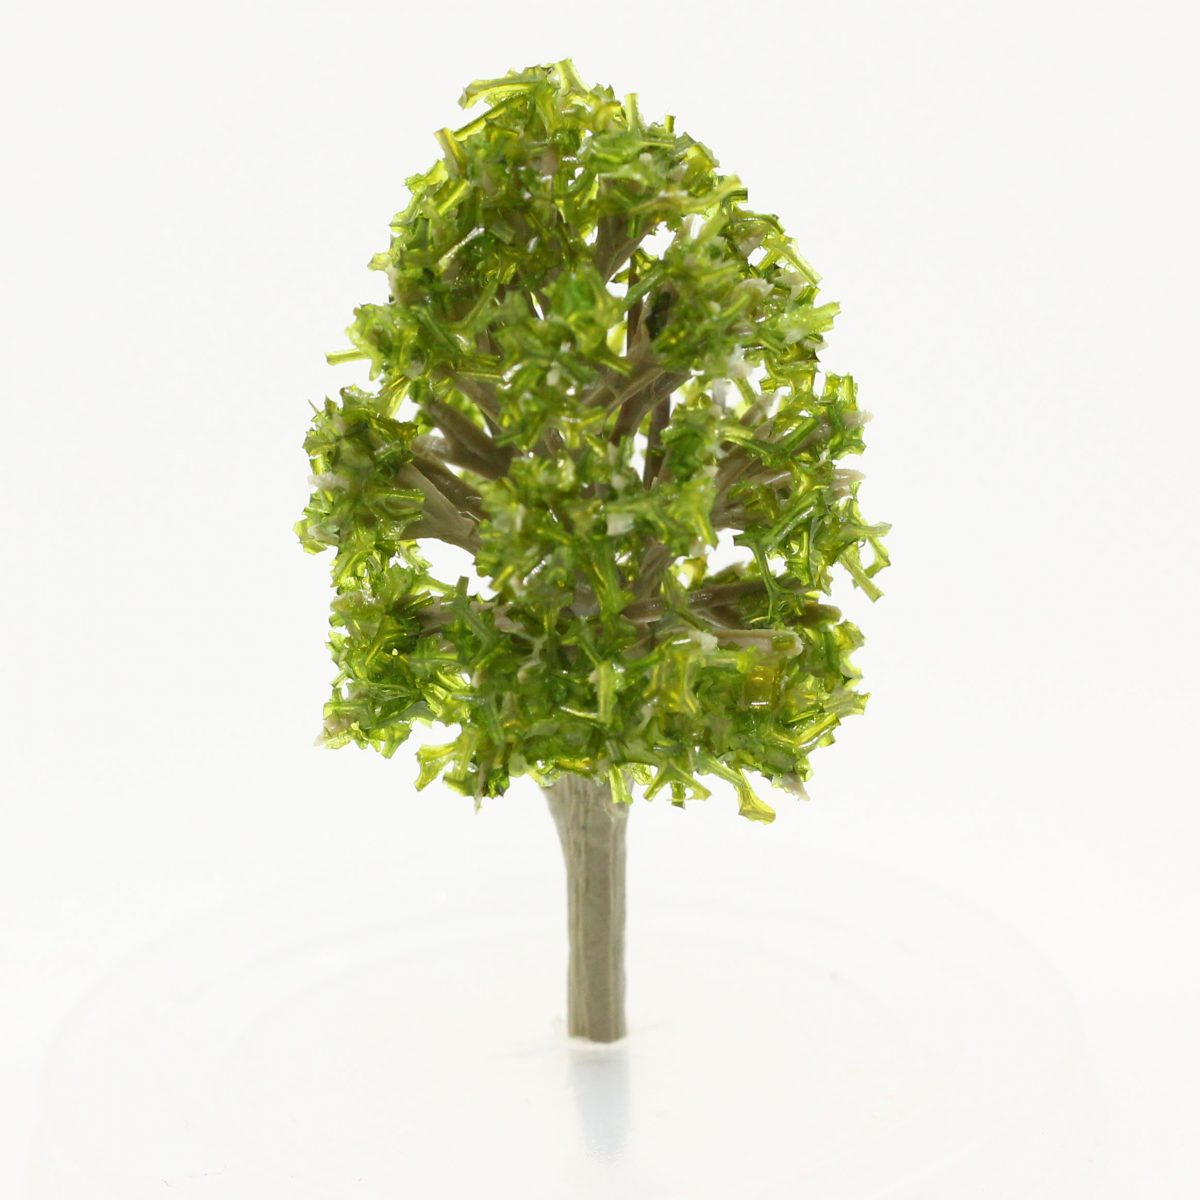 Model Tree suit Eucalyptus - 4cm Image 1